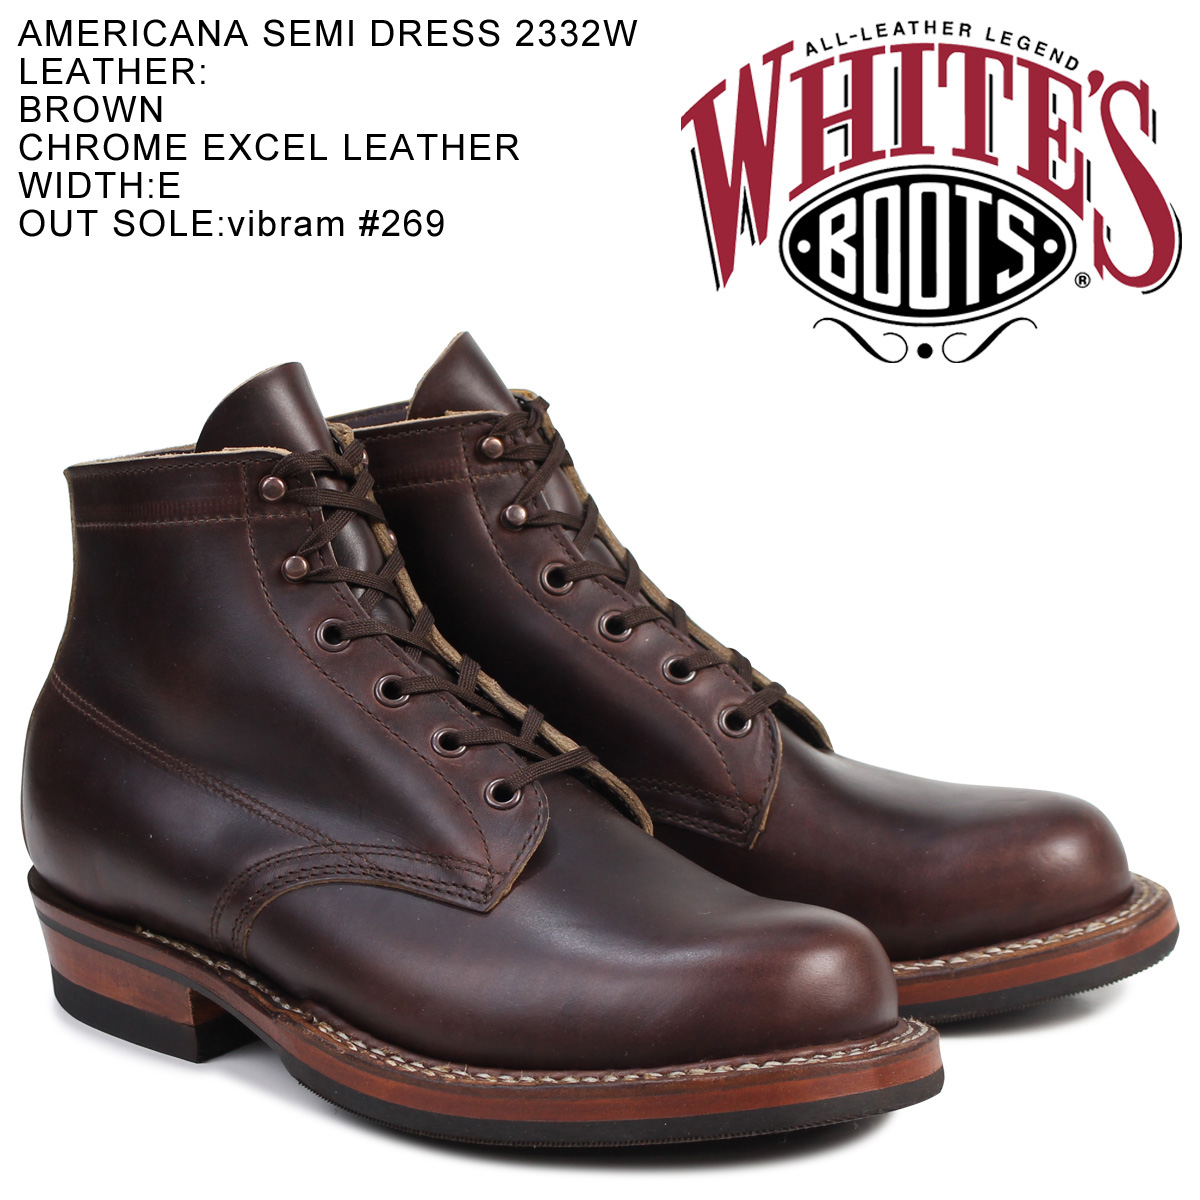 WHITE'S BOOTS ホワイツブーツセミドレス 5INCH AMERICANA SEMIDRESS BOOTS 2332W Eワイズ メンズ ブラウン